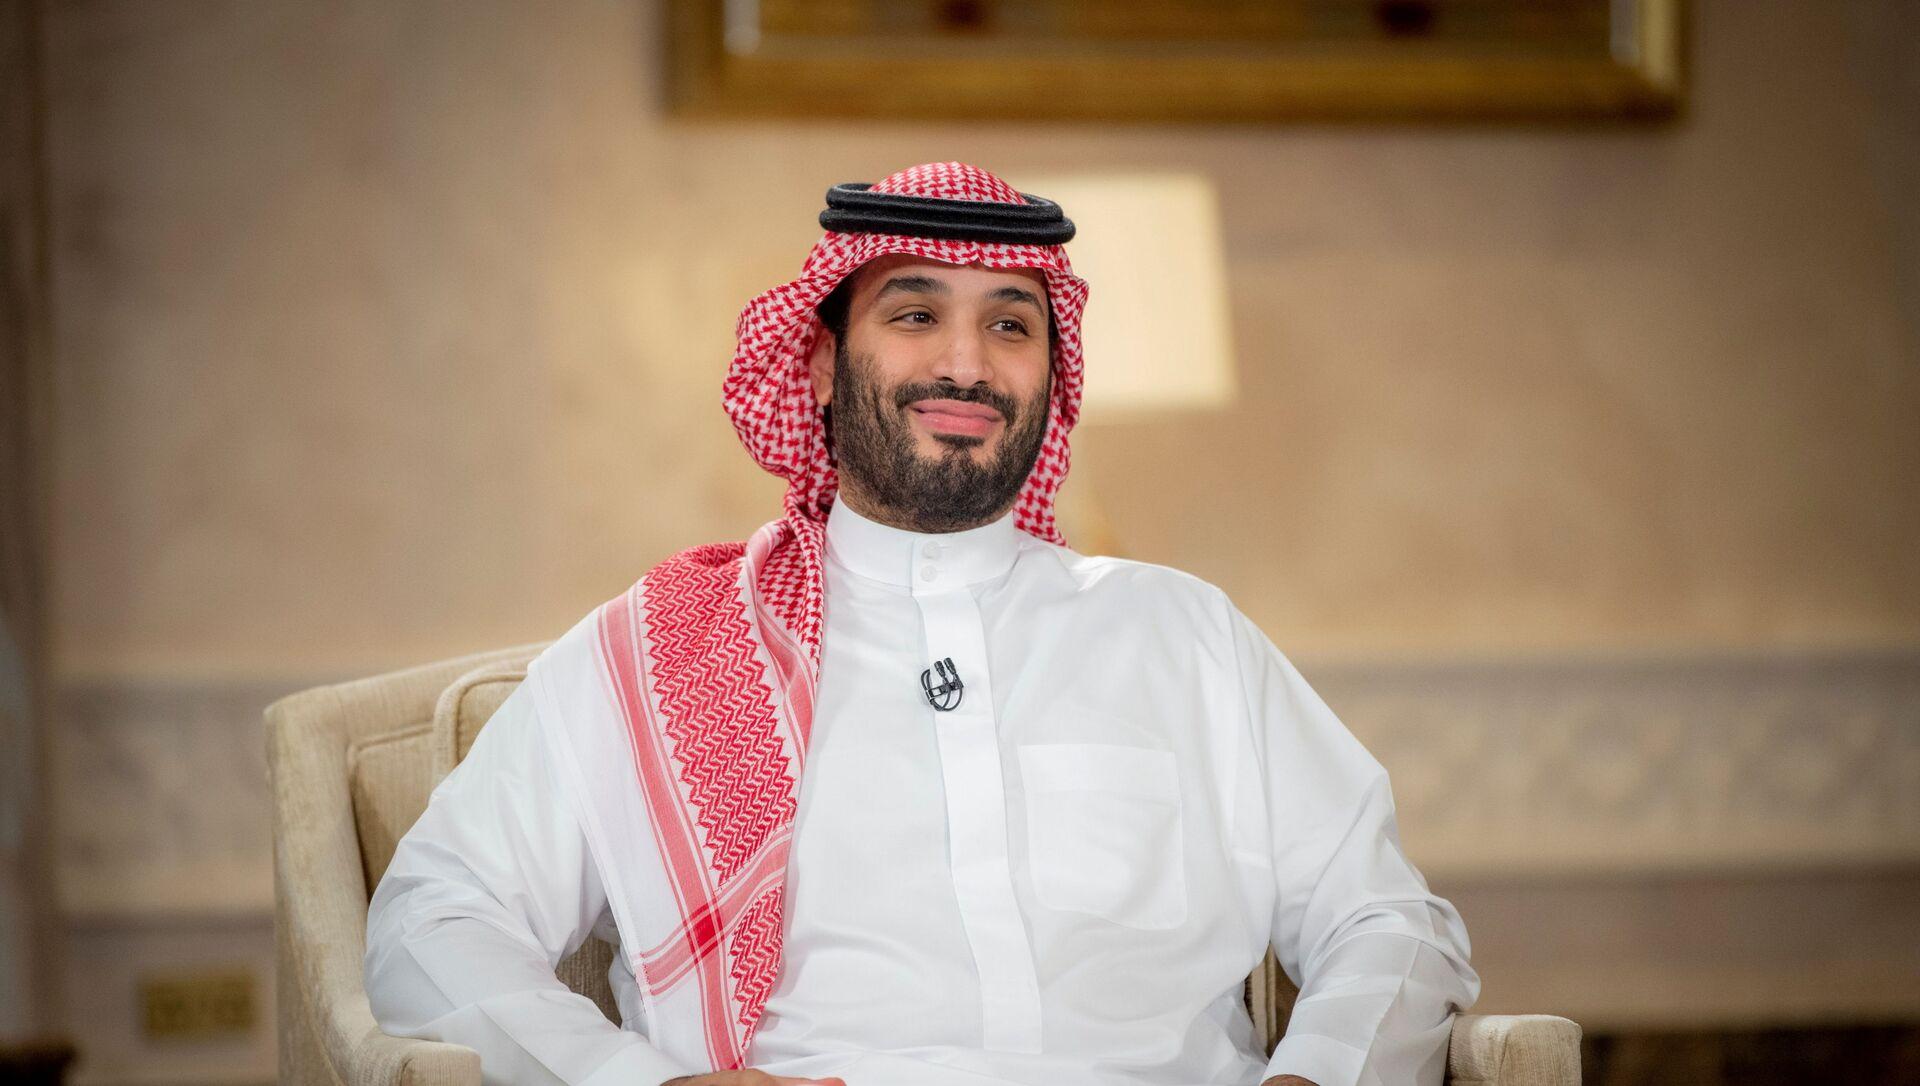 Saudi Crown Prince Mohammed Bin Salman smiles during a televised interview in Riyadh, Saudi Arabia, April 27, 2021. Picture taken April 27, 2021. - Sputnik International, 1920, 19.05.2021